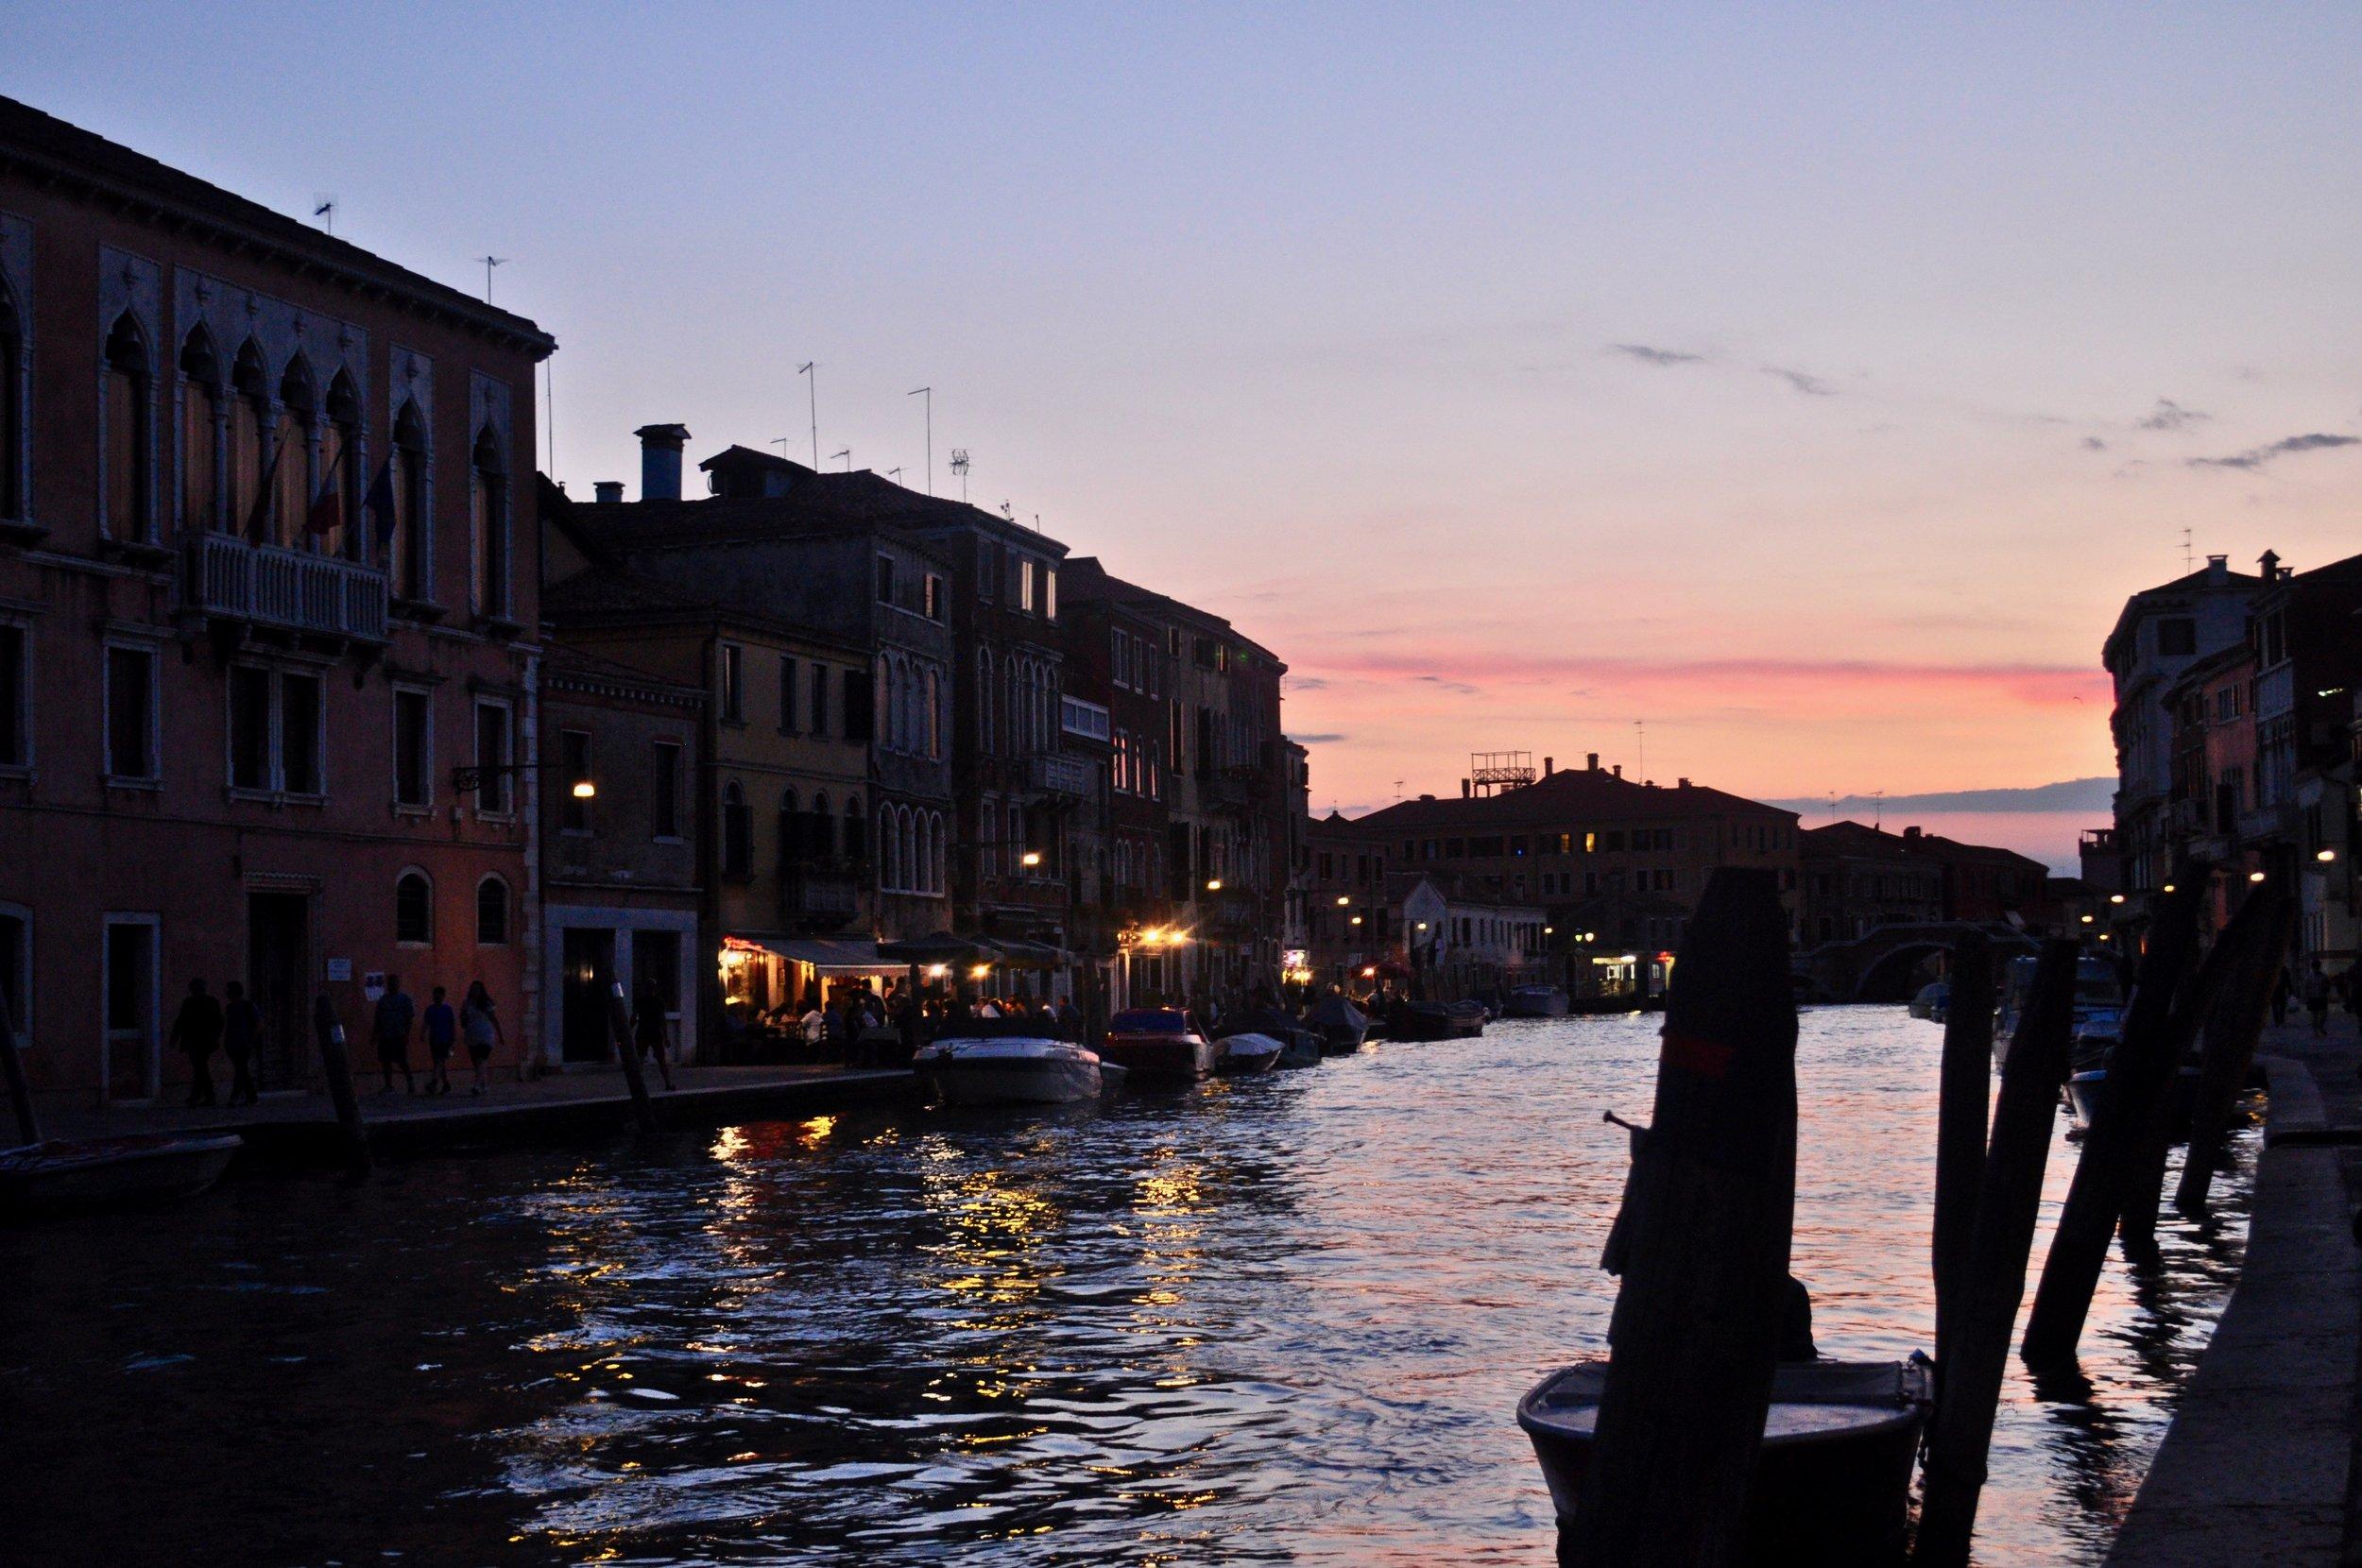 Nighttime in Venice